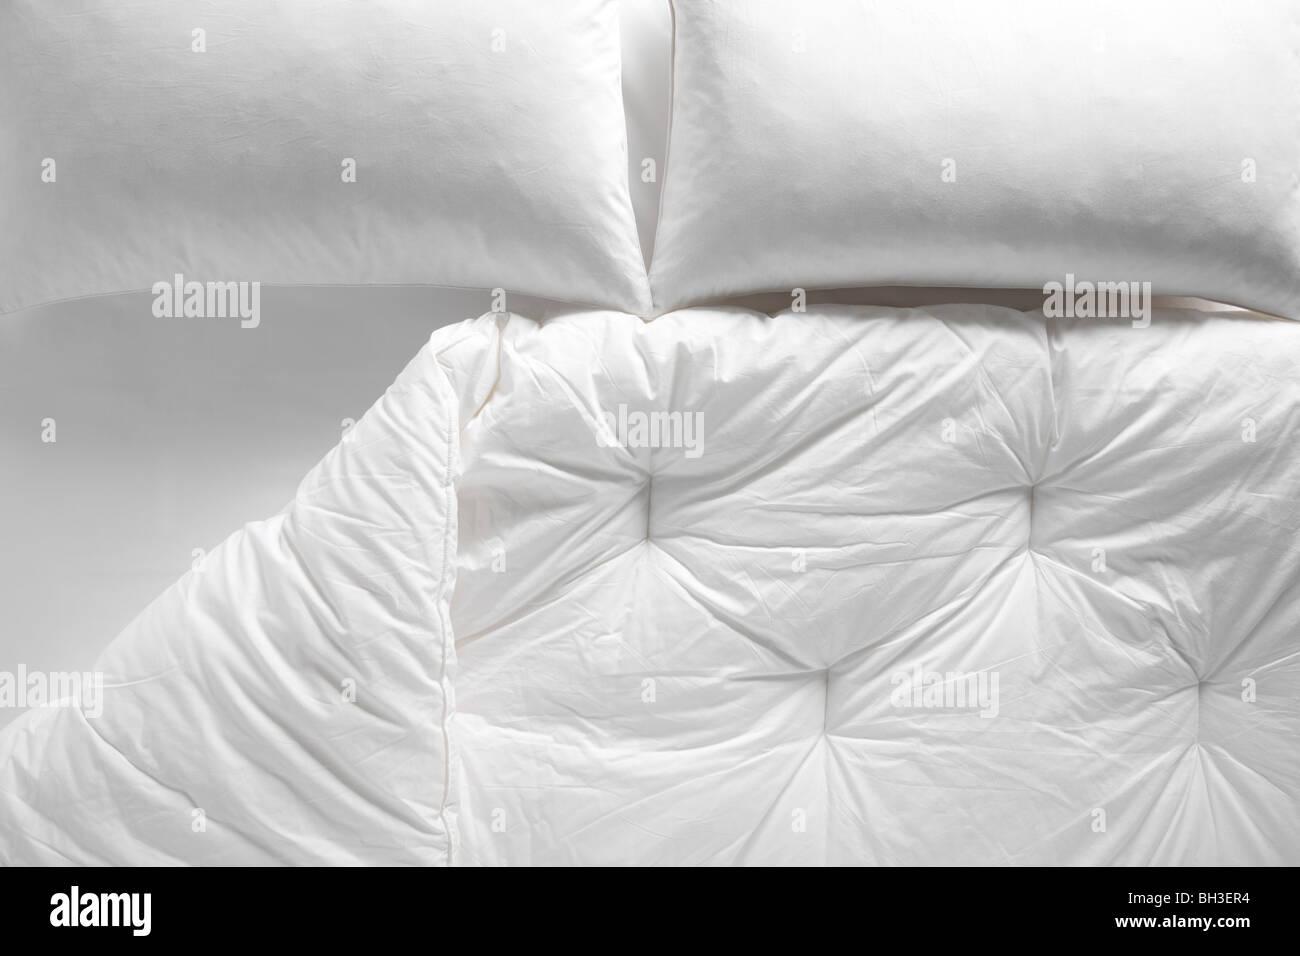 White duvet and pillows - Stock Image